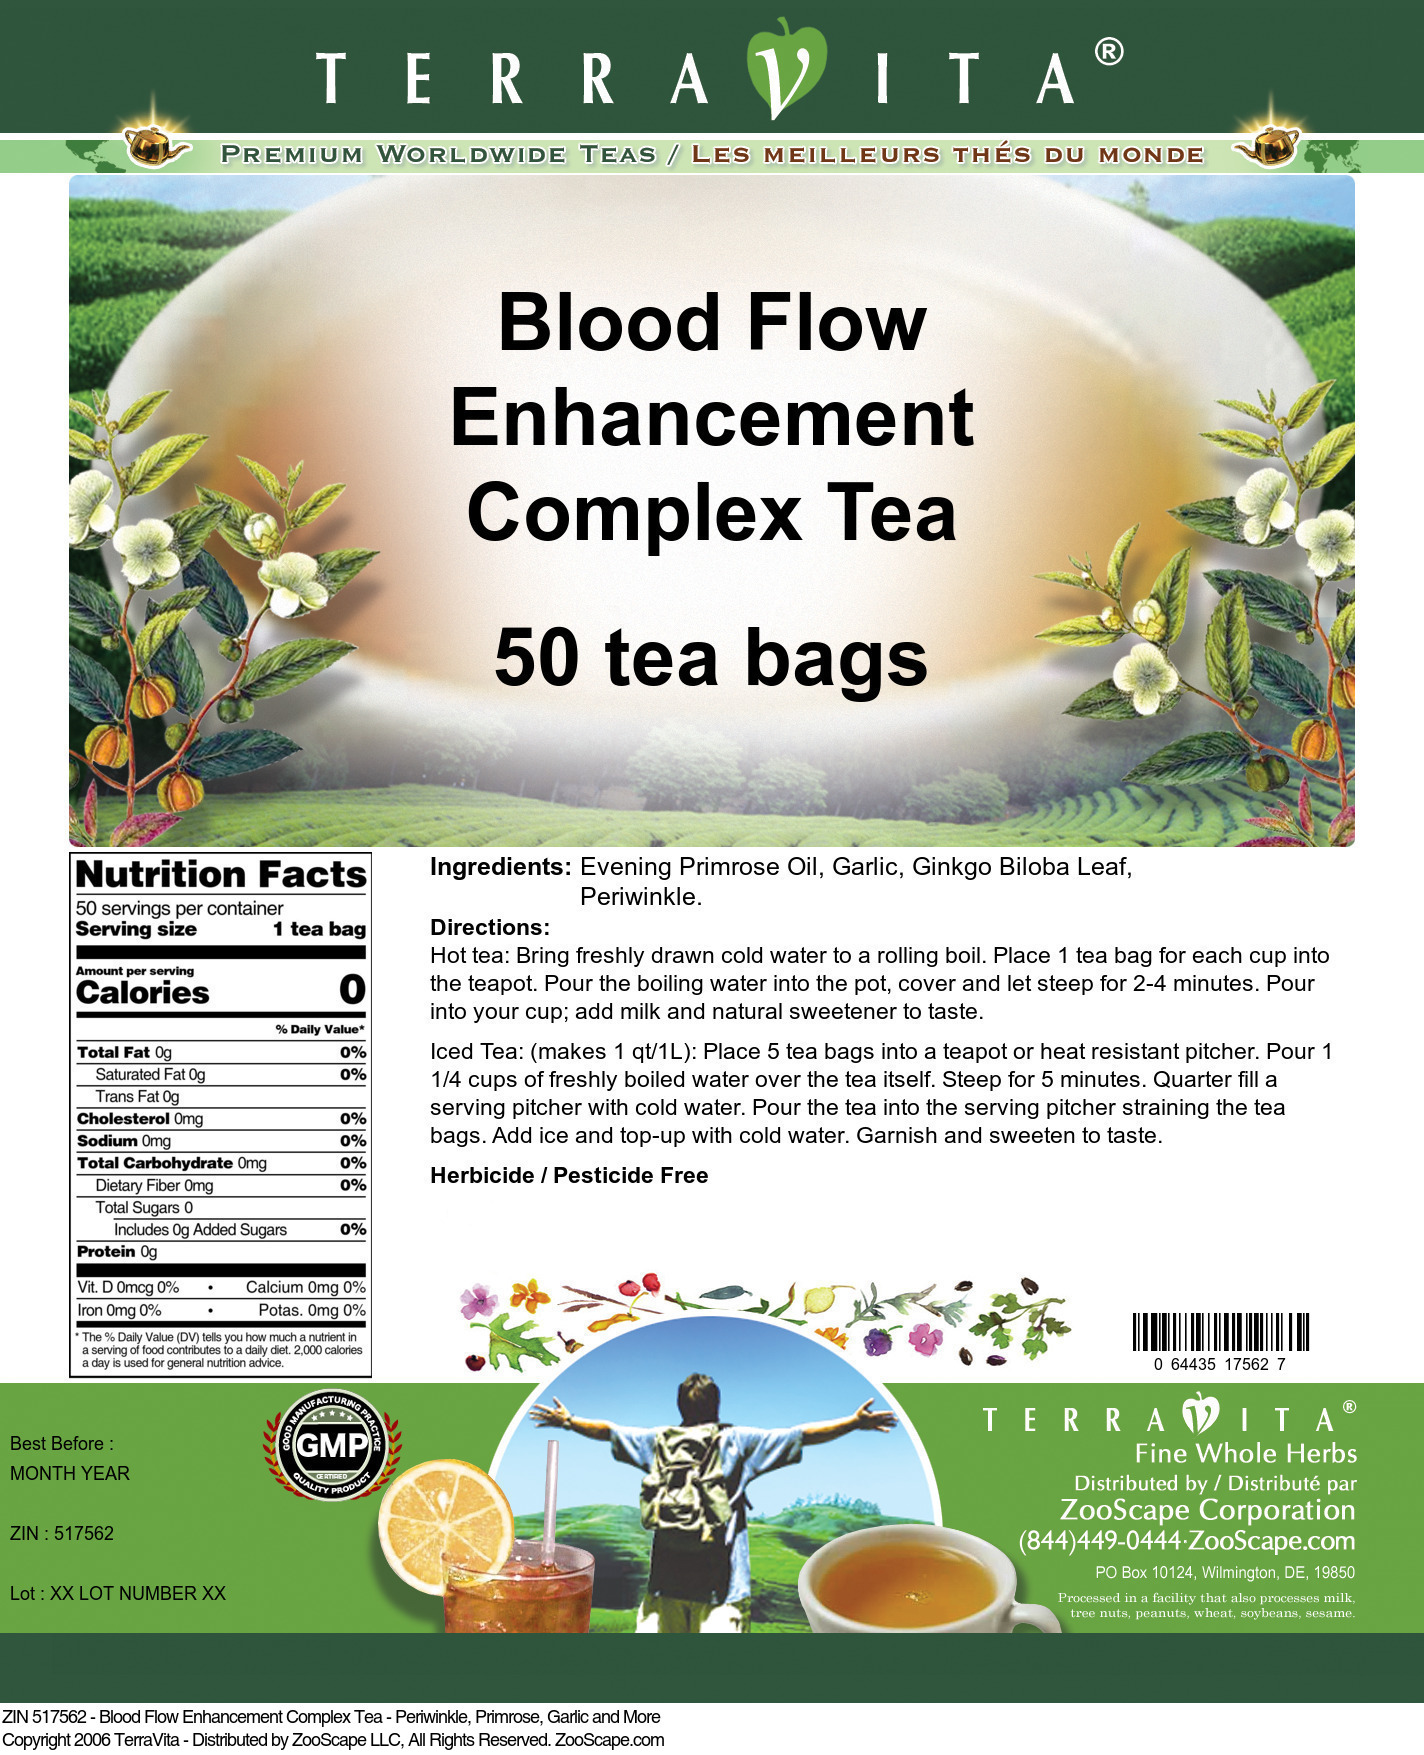 Blood Flow Enhancement Complex Tea - Periwinkle, Primrose, Garlic and More